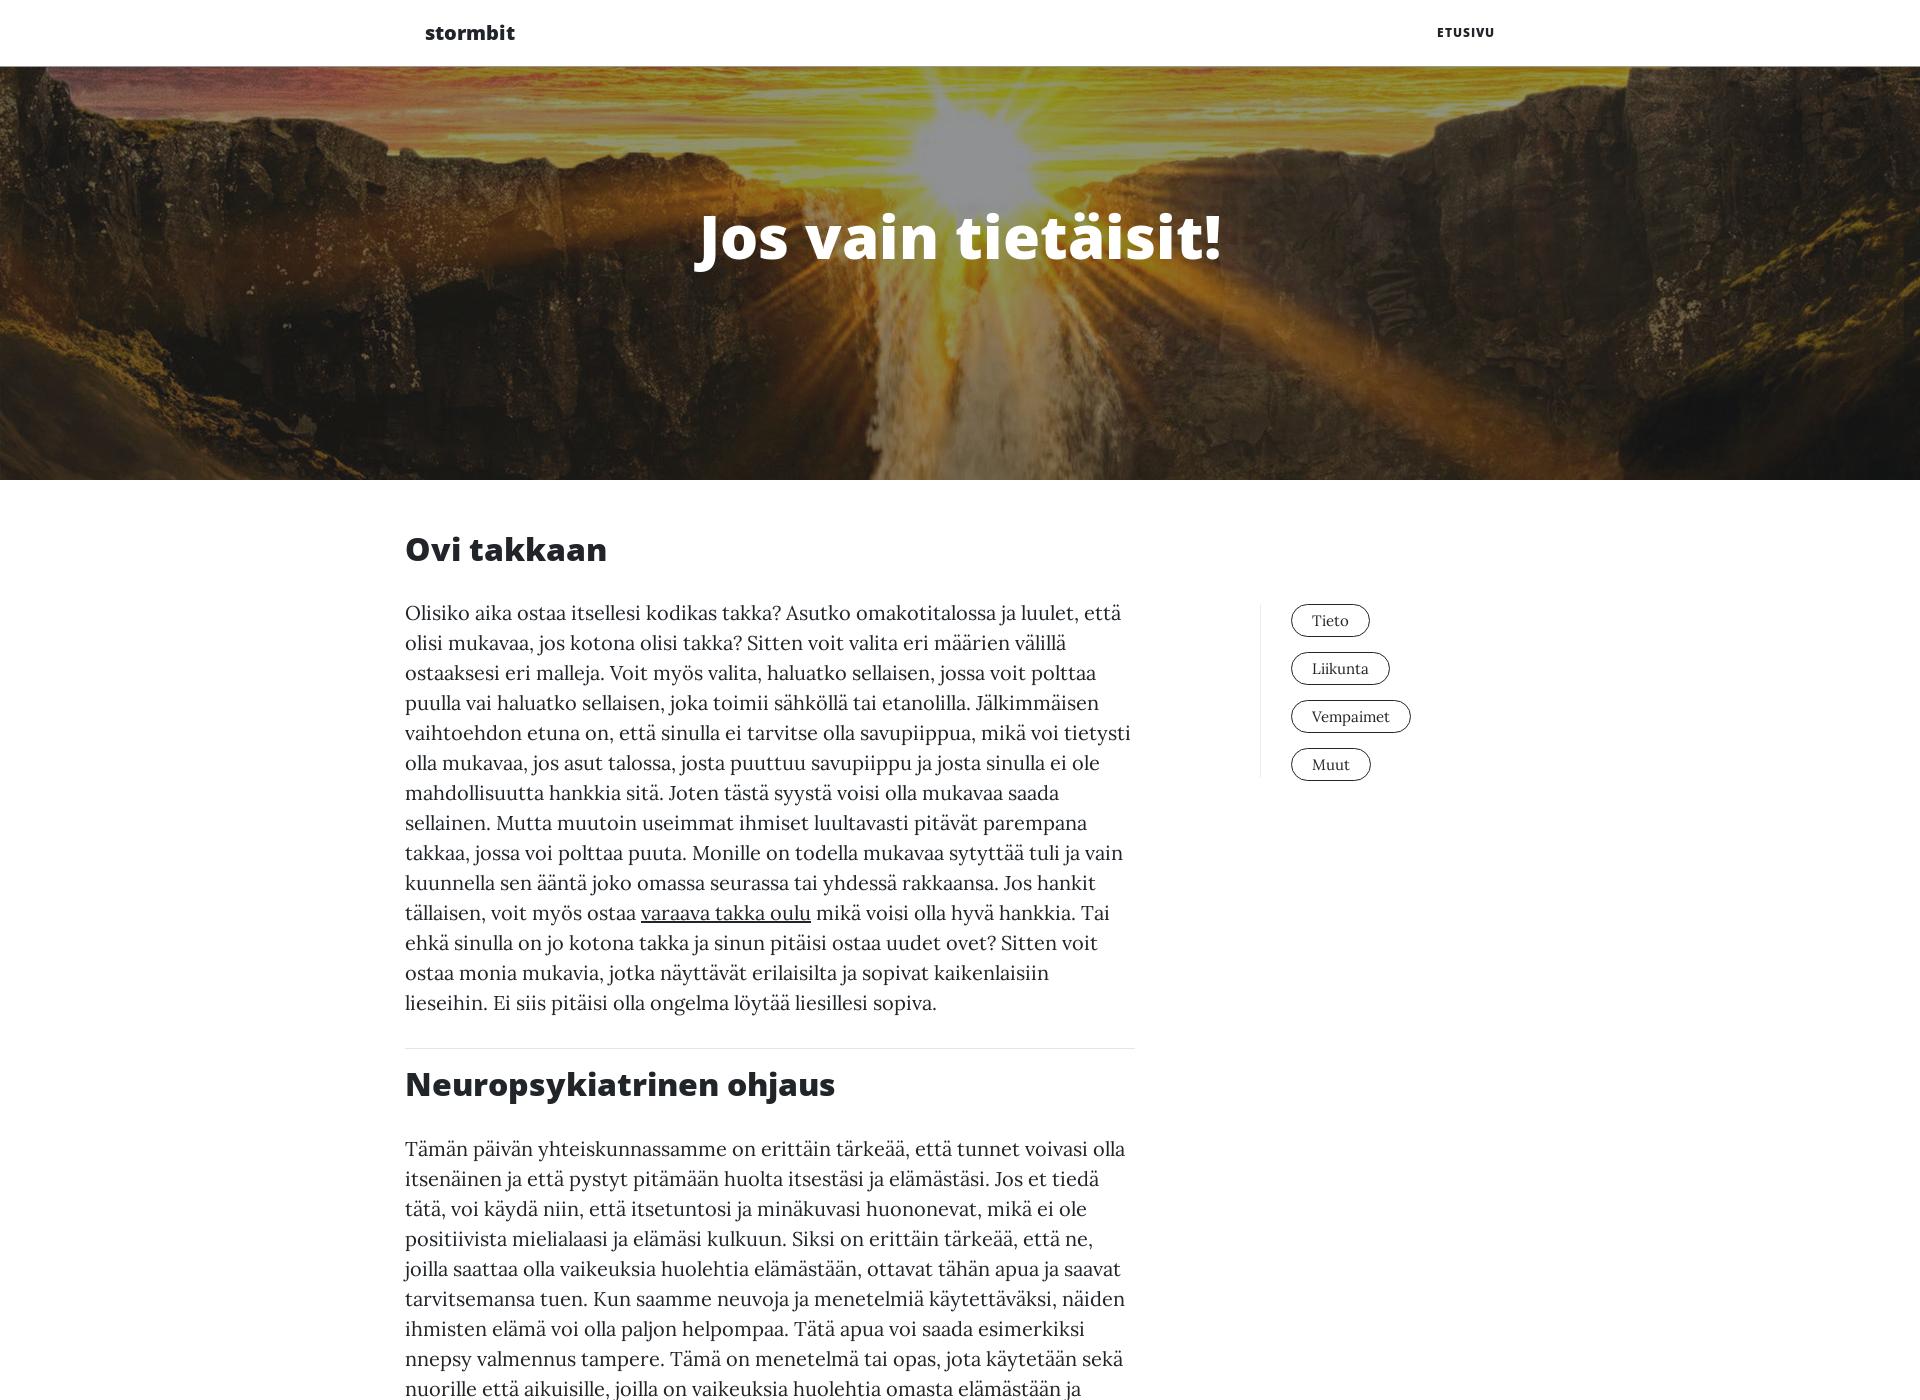 Screenshot for stormbit.fi